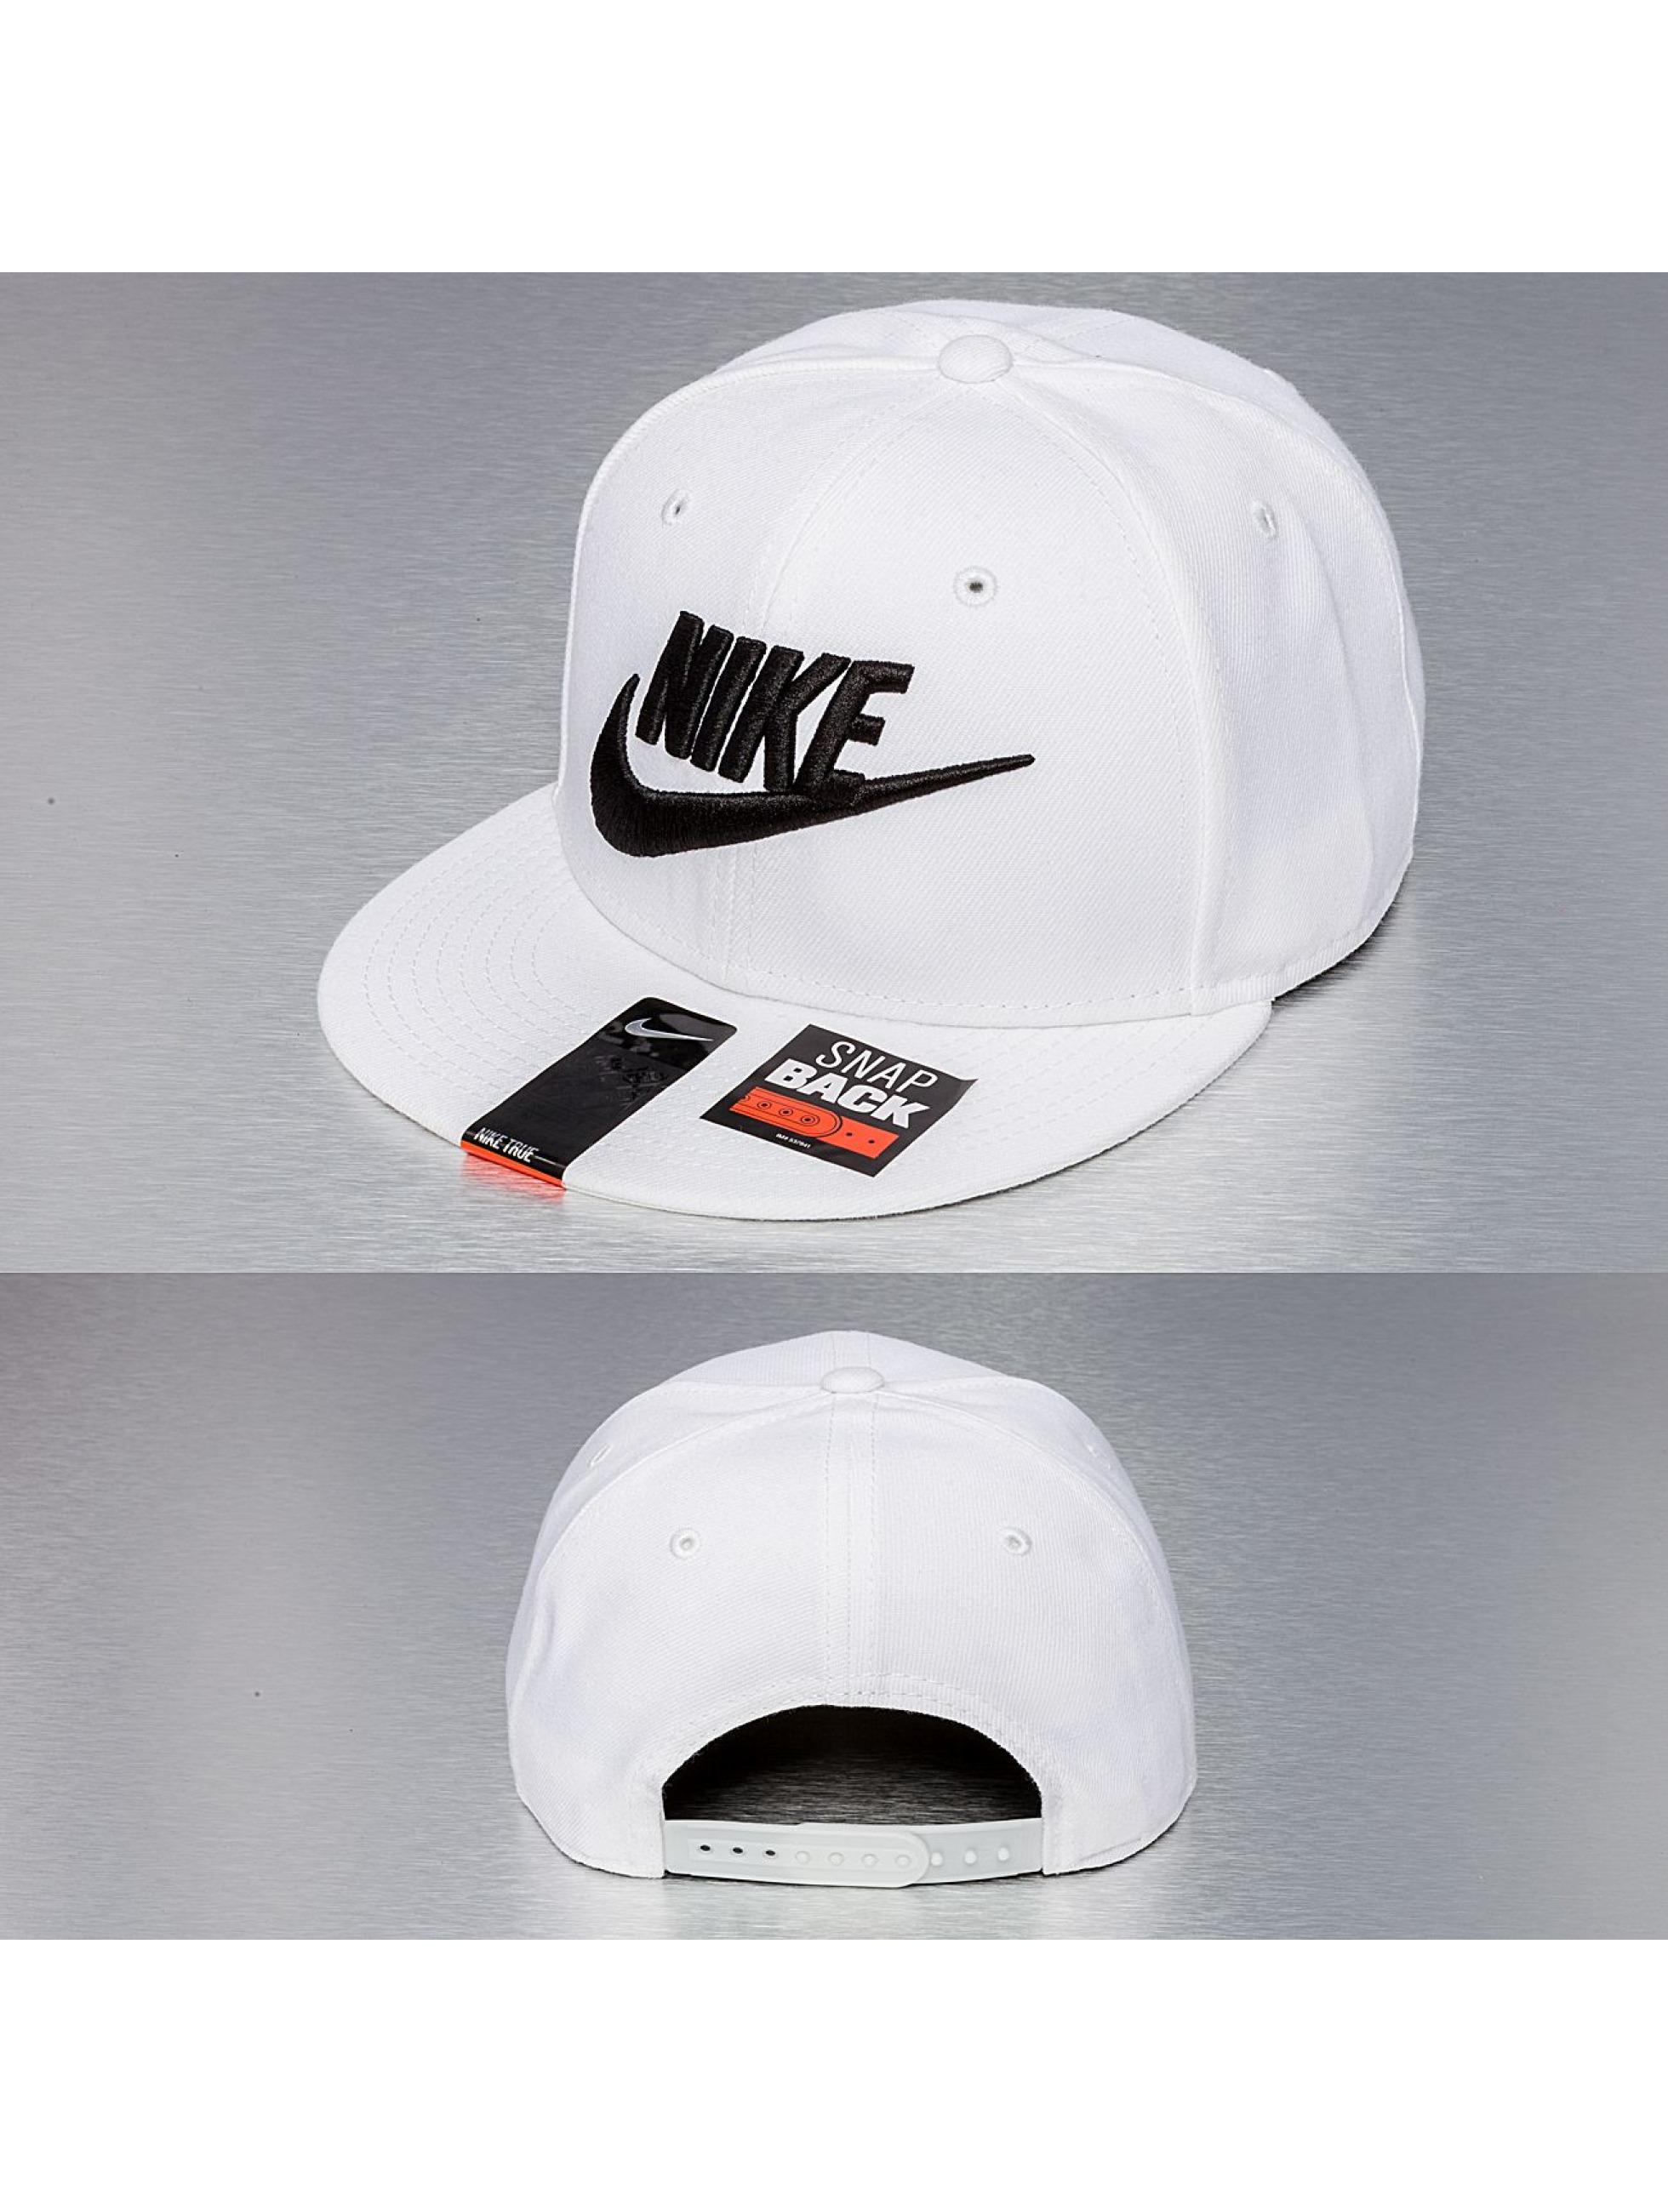 nike air max cb 94 - Nike Casquette / Snapback True Graphic Futura en blanc 115325